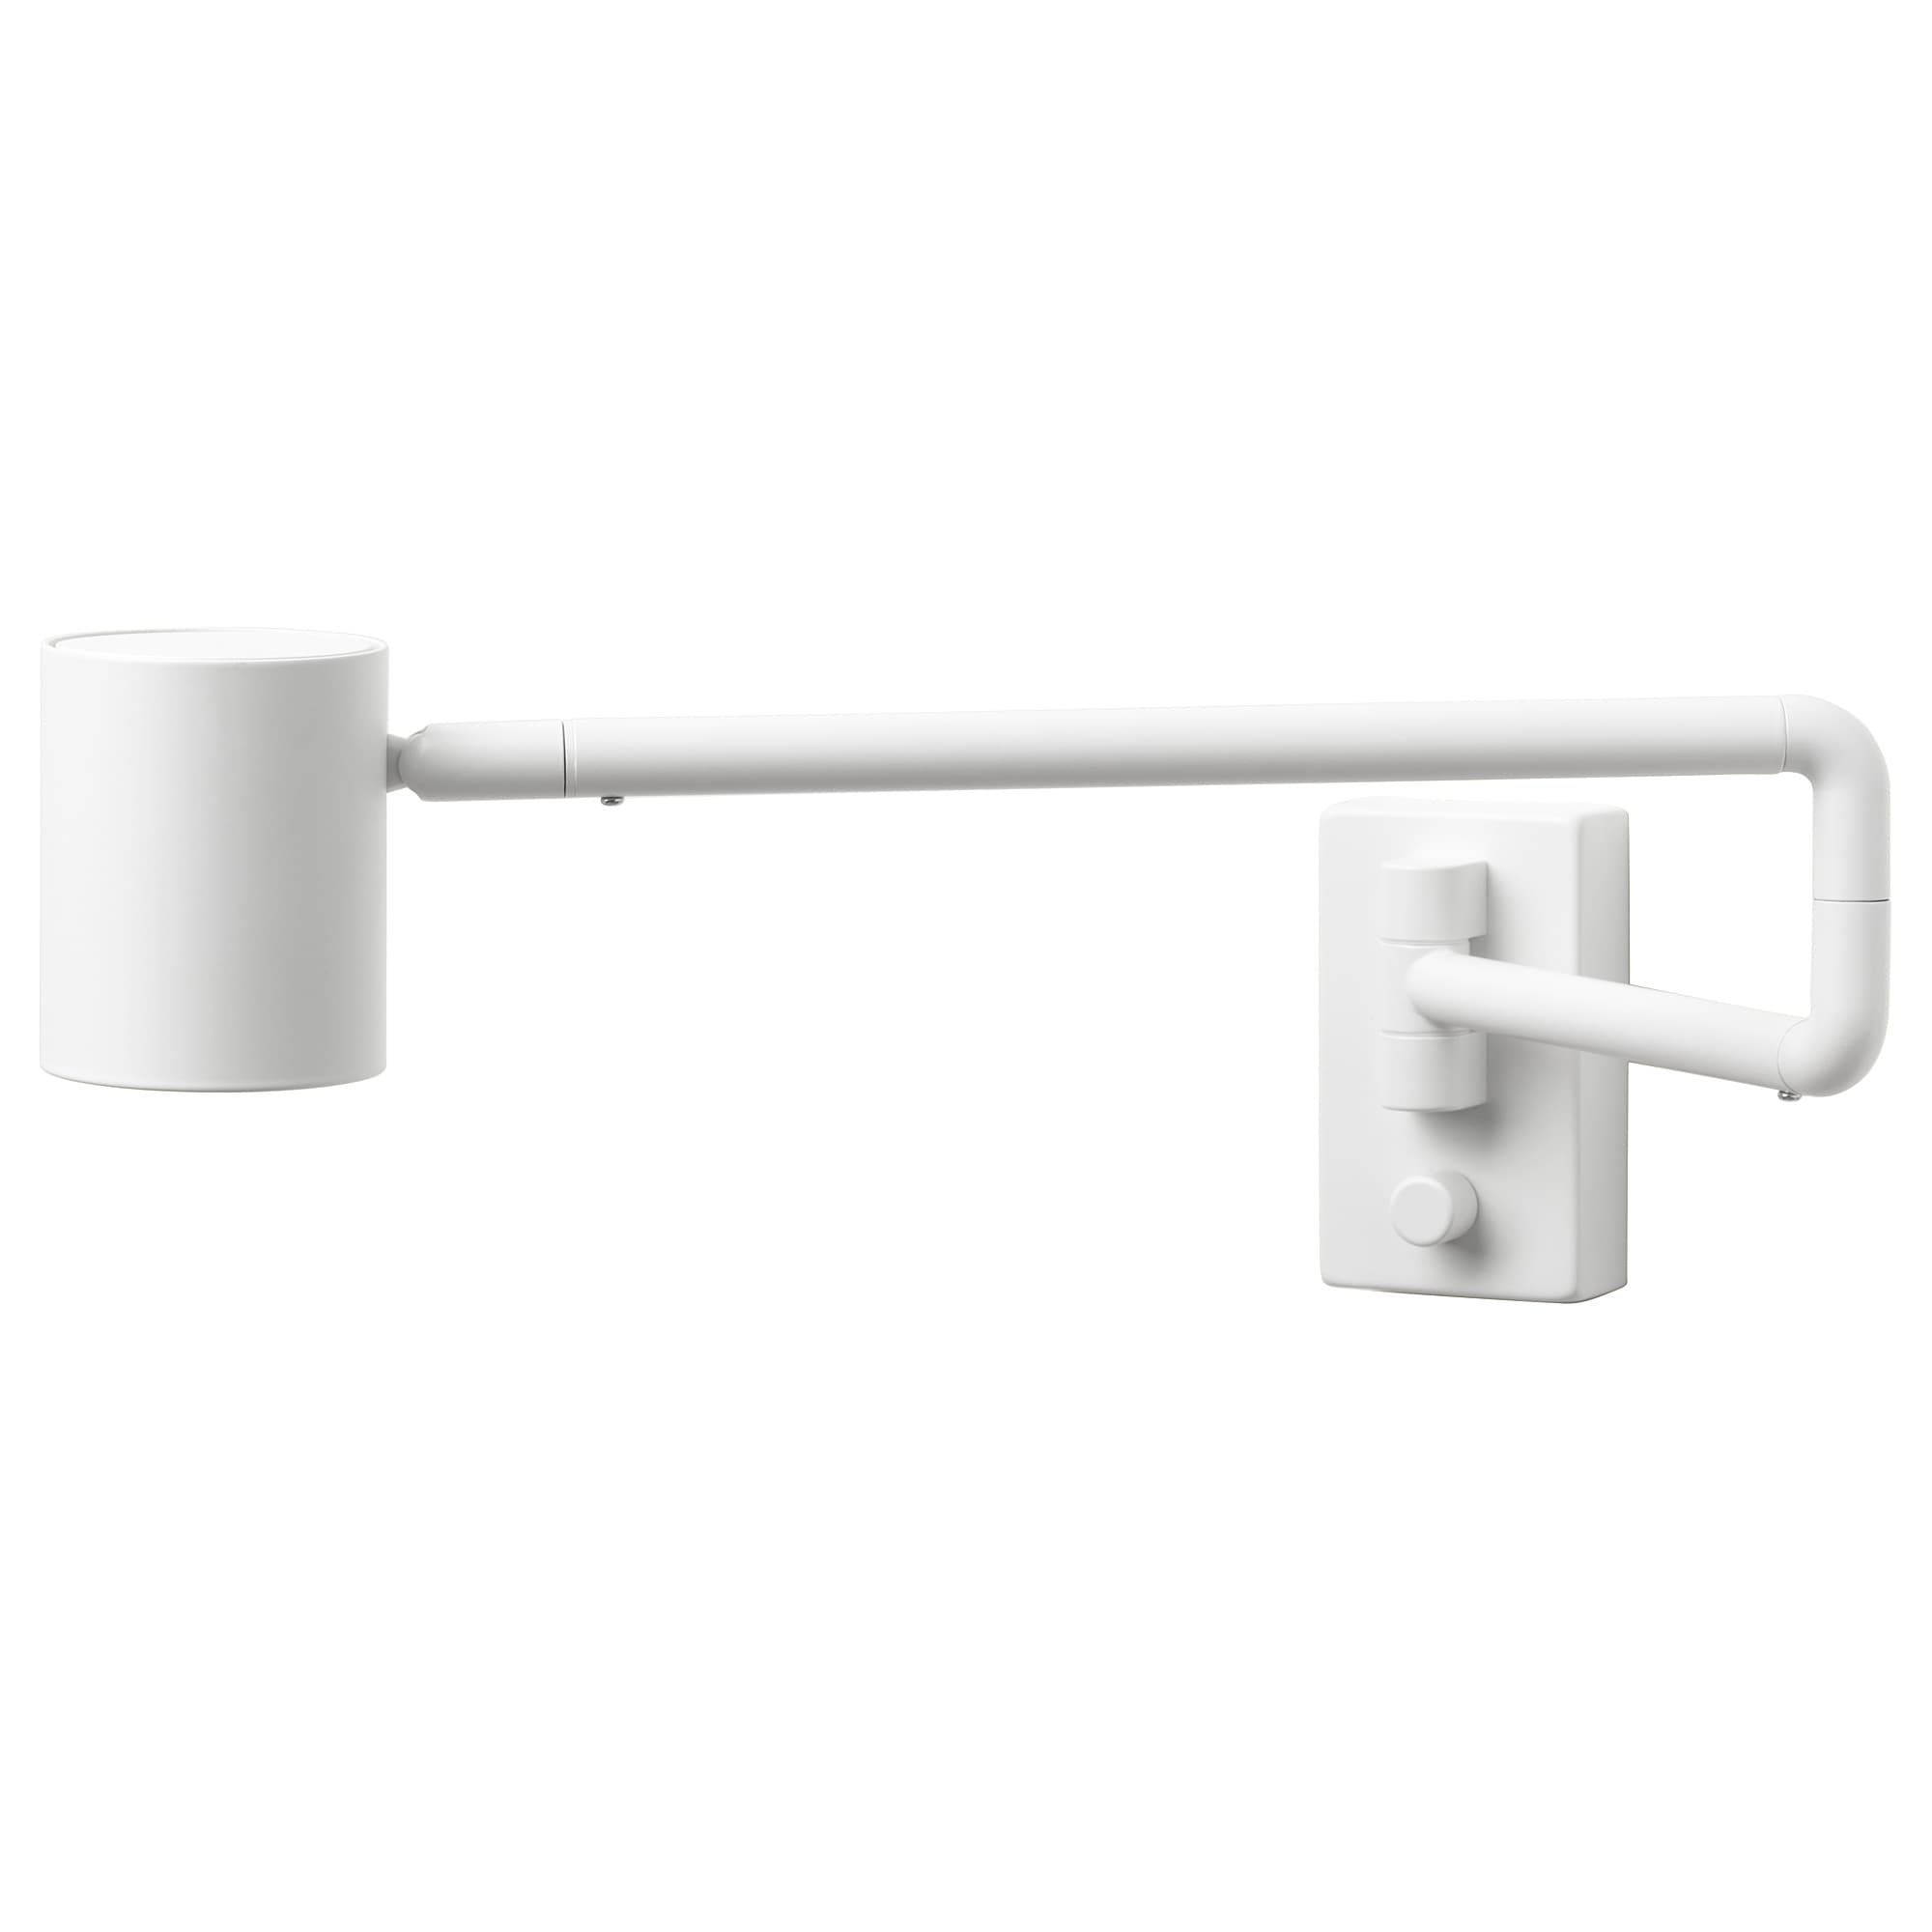 NYMÅNE Lampada parete girev instal fissa IKEA Lampada